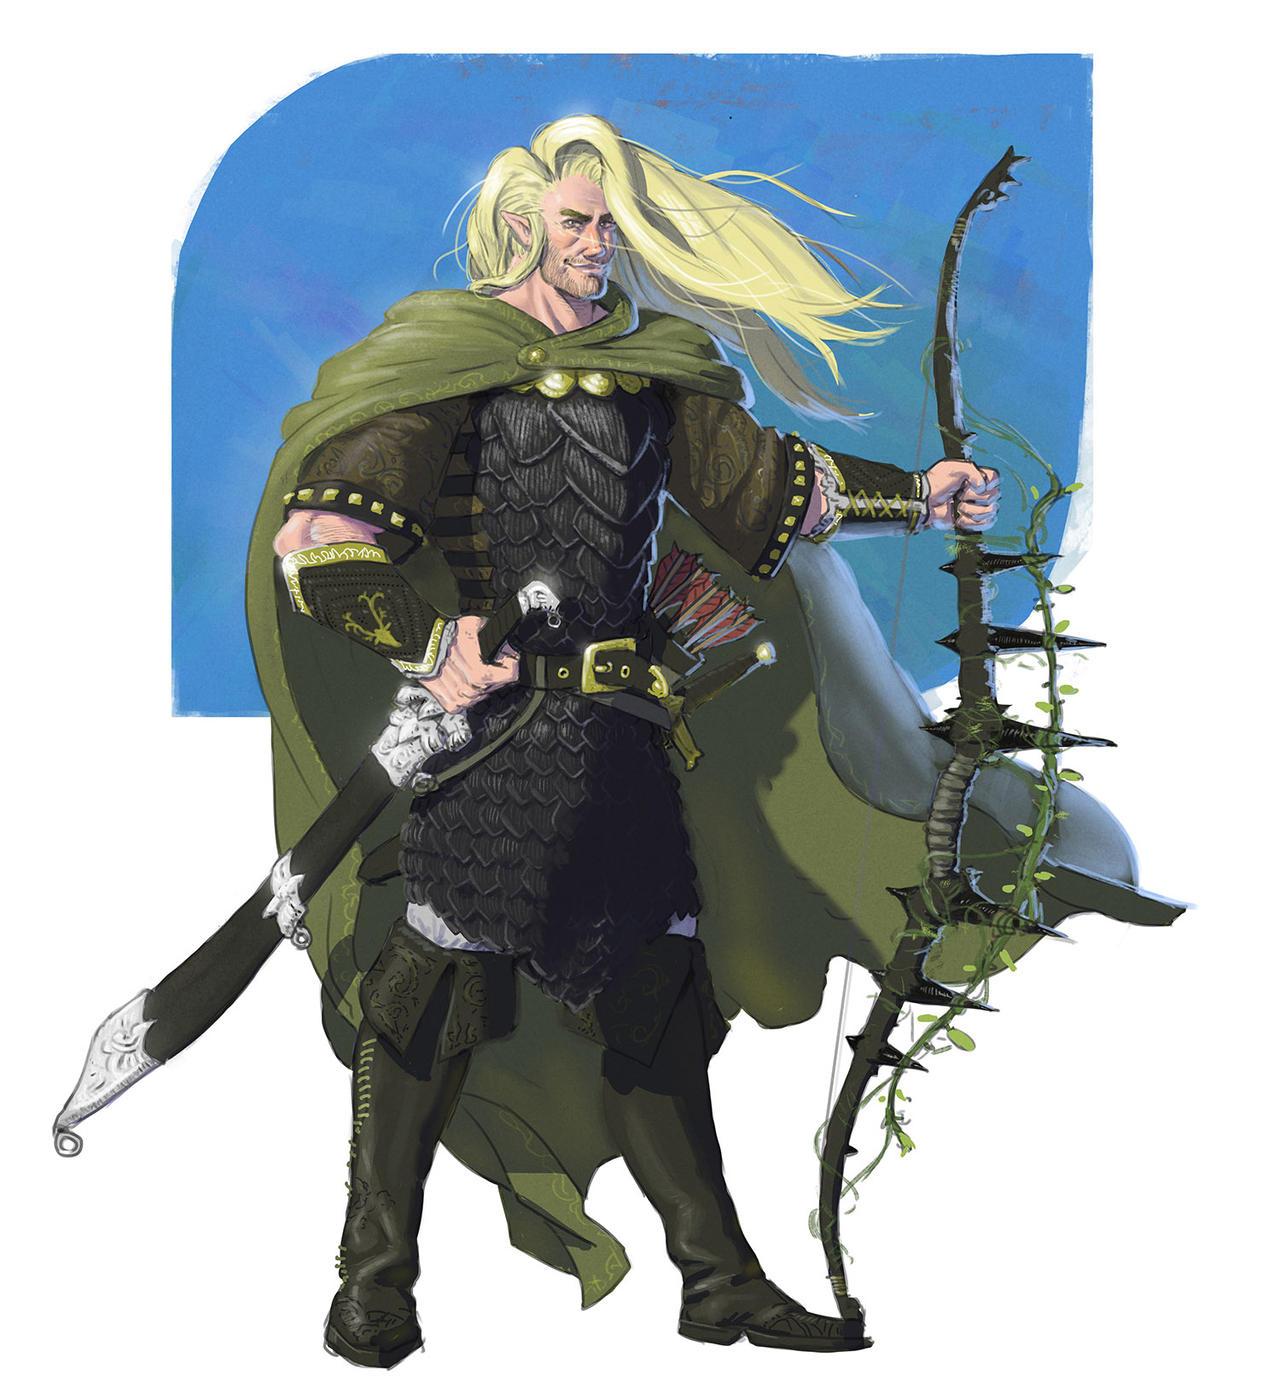 [Image: half_elven_ranger_by_rezq88_ddoxg85-full...u3Ize7nkSE]